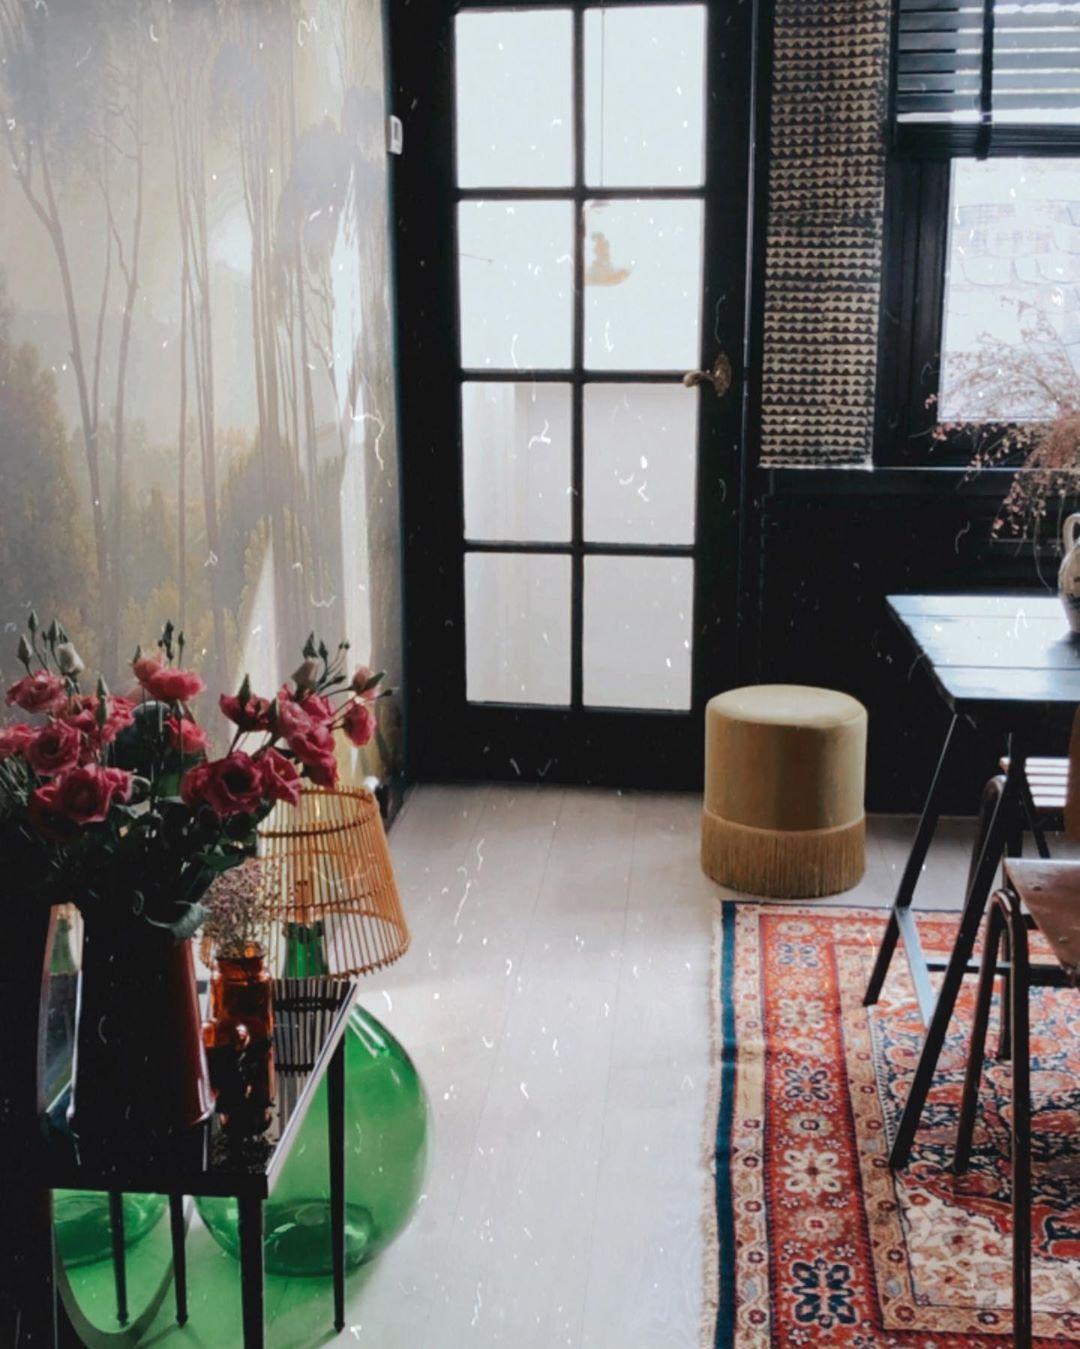 #sfeervolwonen #myhome #interiors #interiorstyling #homedecor #interiordecor #homeinspo #stoerwonen #interiordesign...